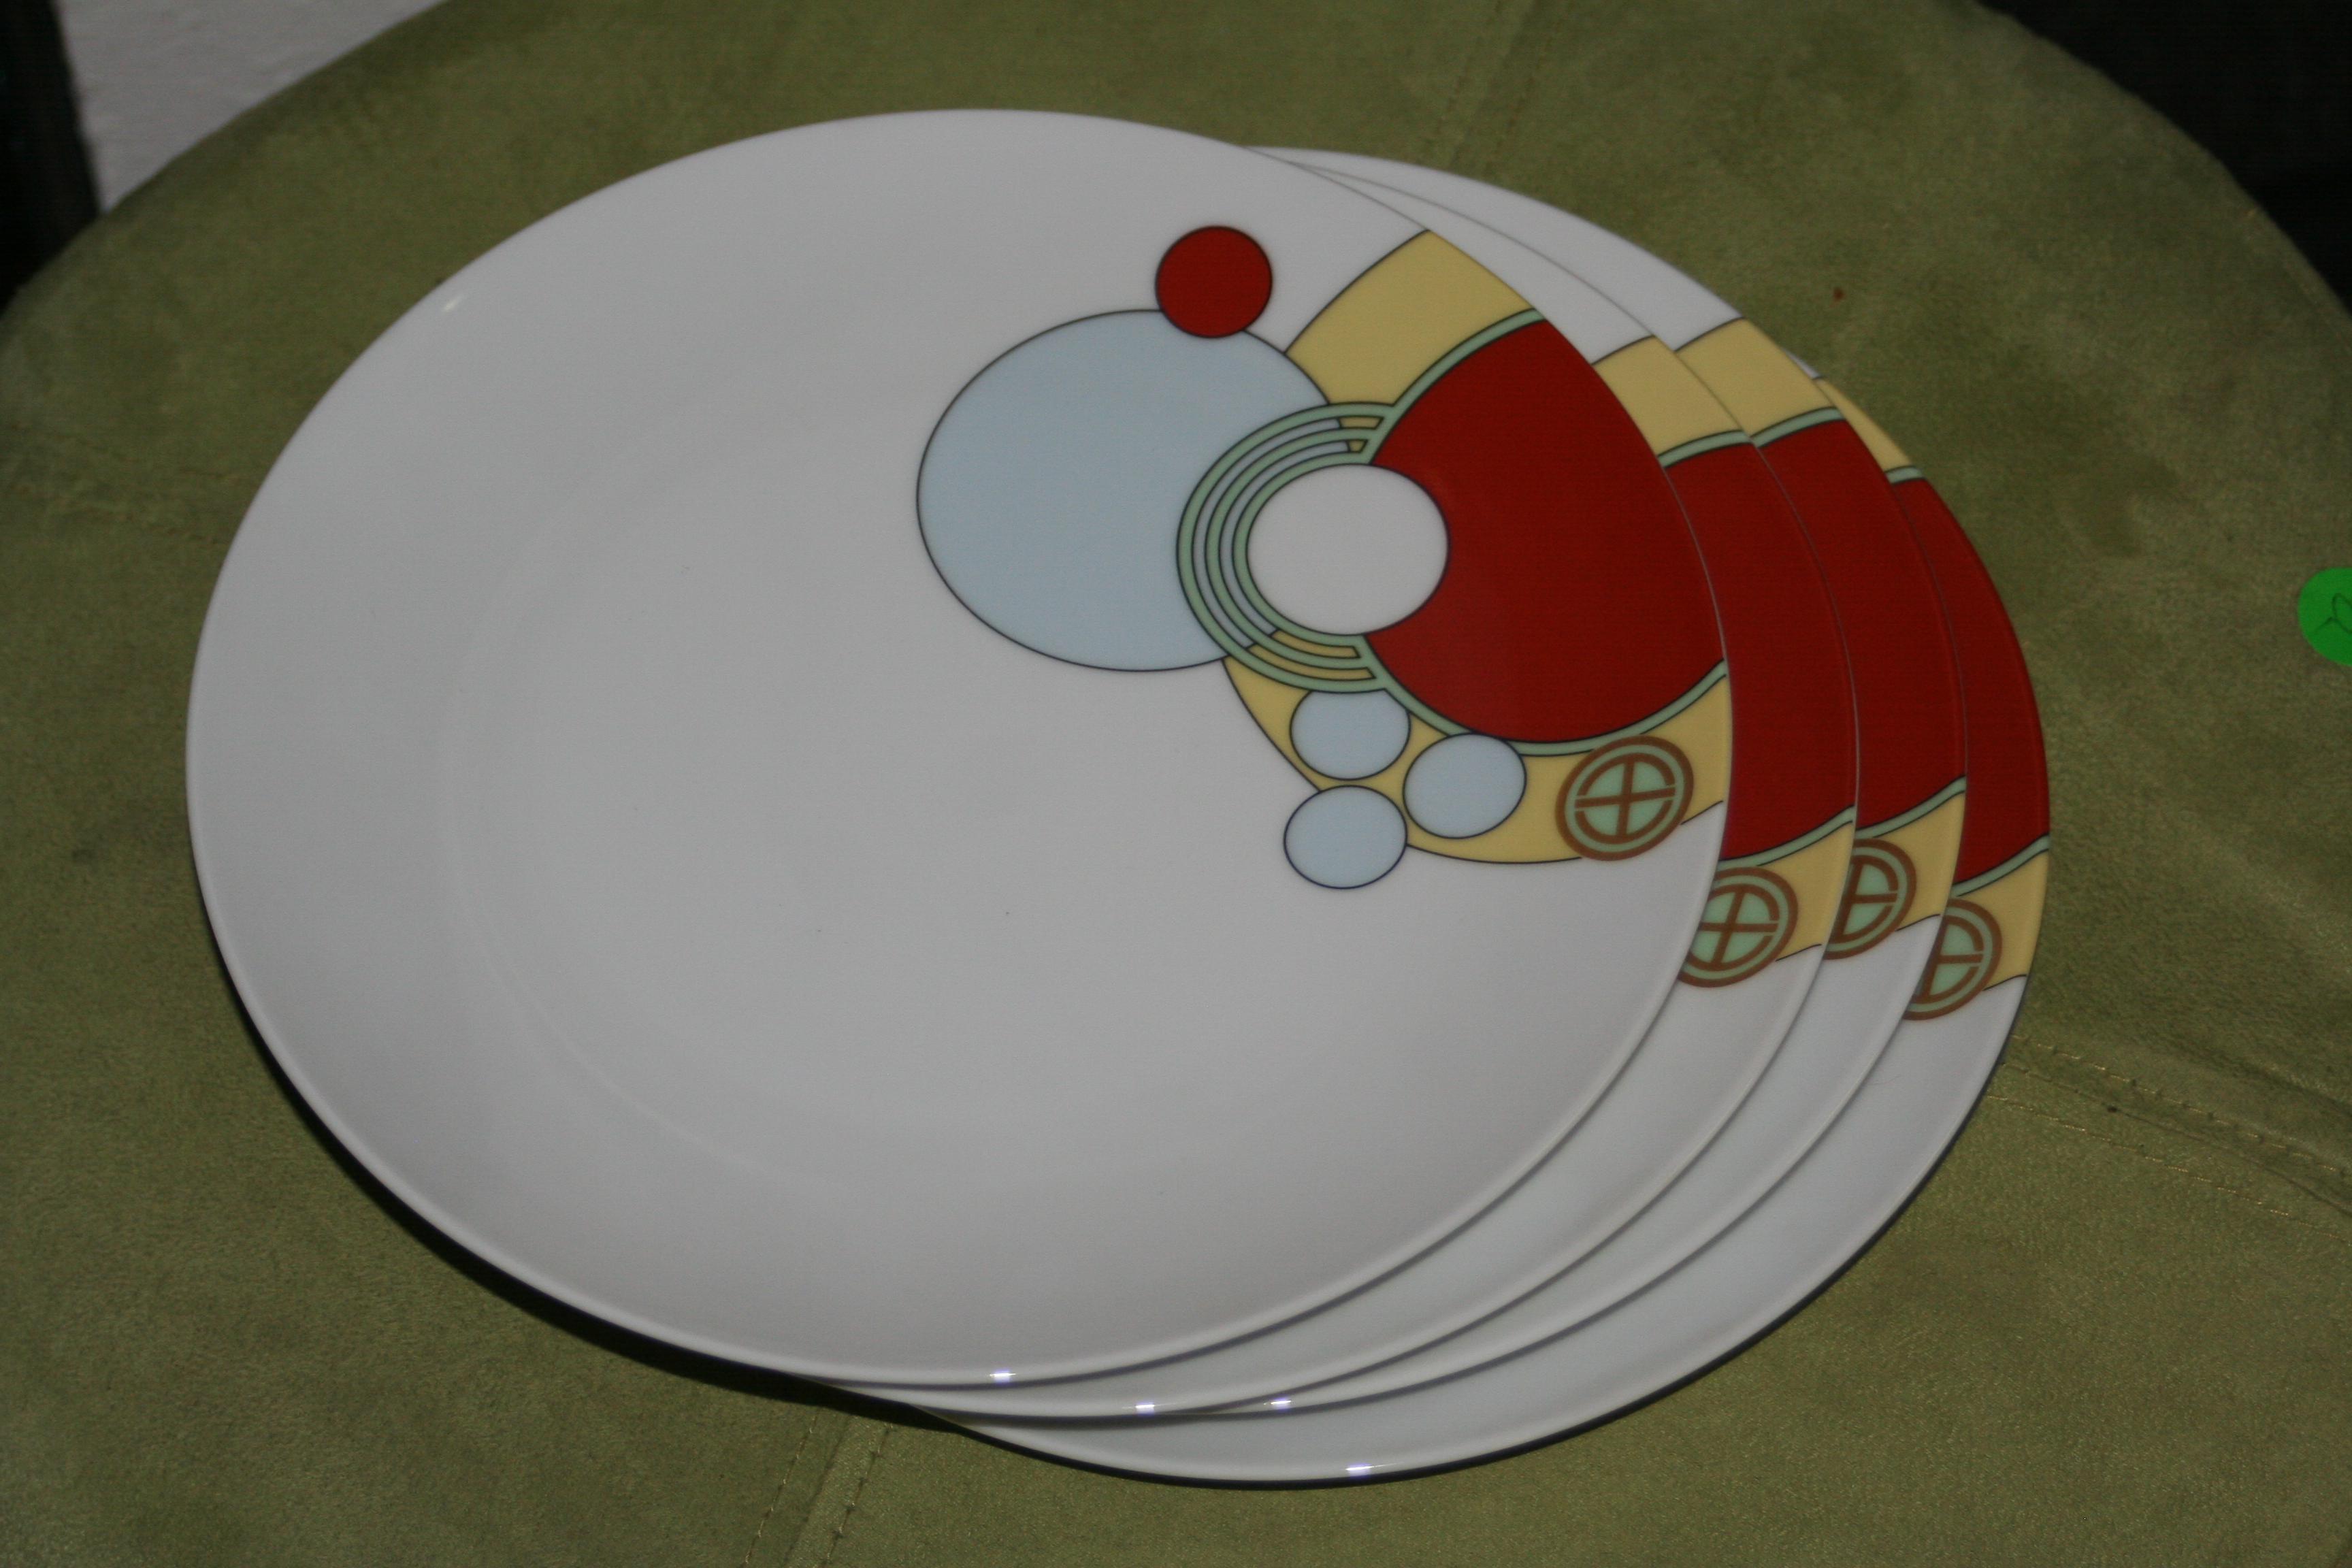 Frank Lloyd Wright for Noritake Imperial Hotel Dinnerware - 18 Pc. - Image 8 of  sc 1 st  Chairish & Frank Lloyd Wright for Noritake Imperial Hotel Dinnerware - 18 Pc ...